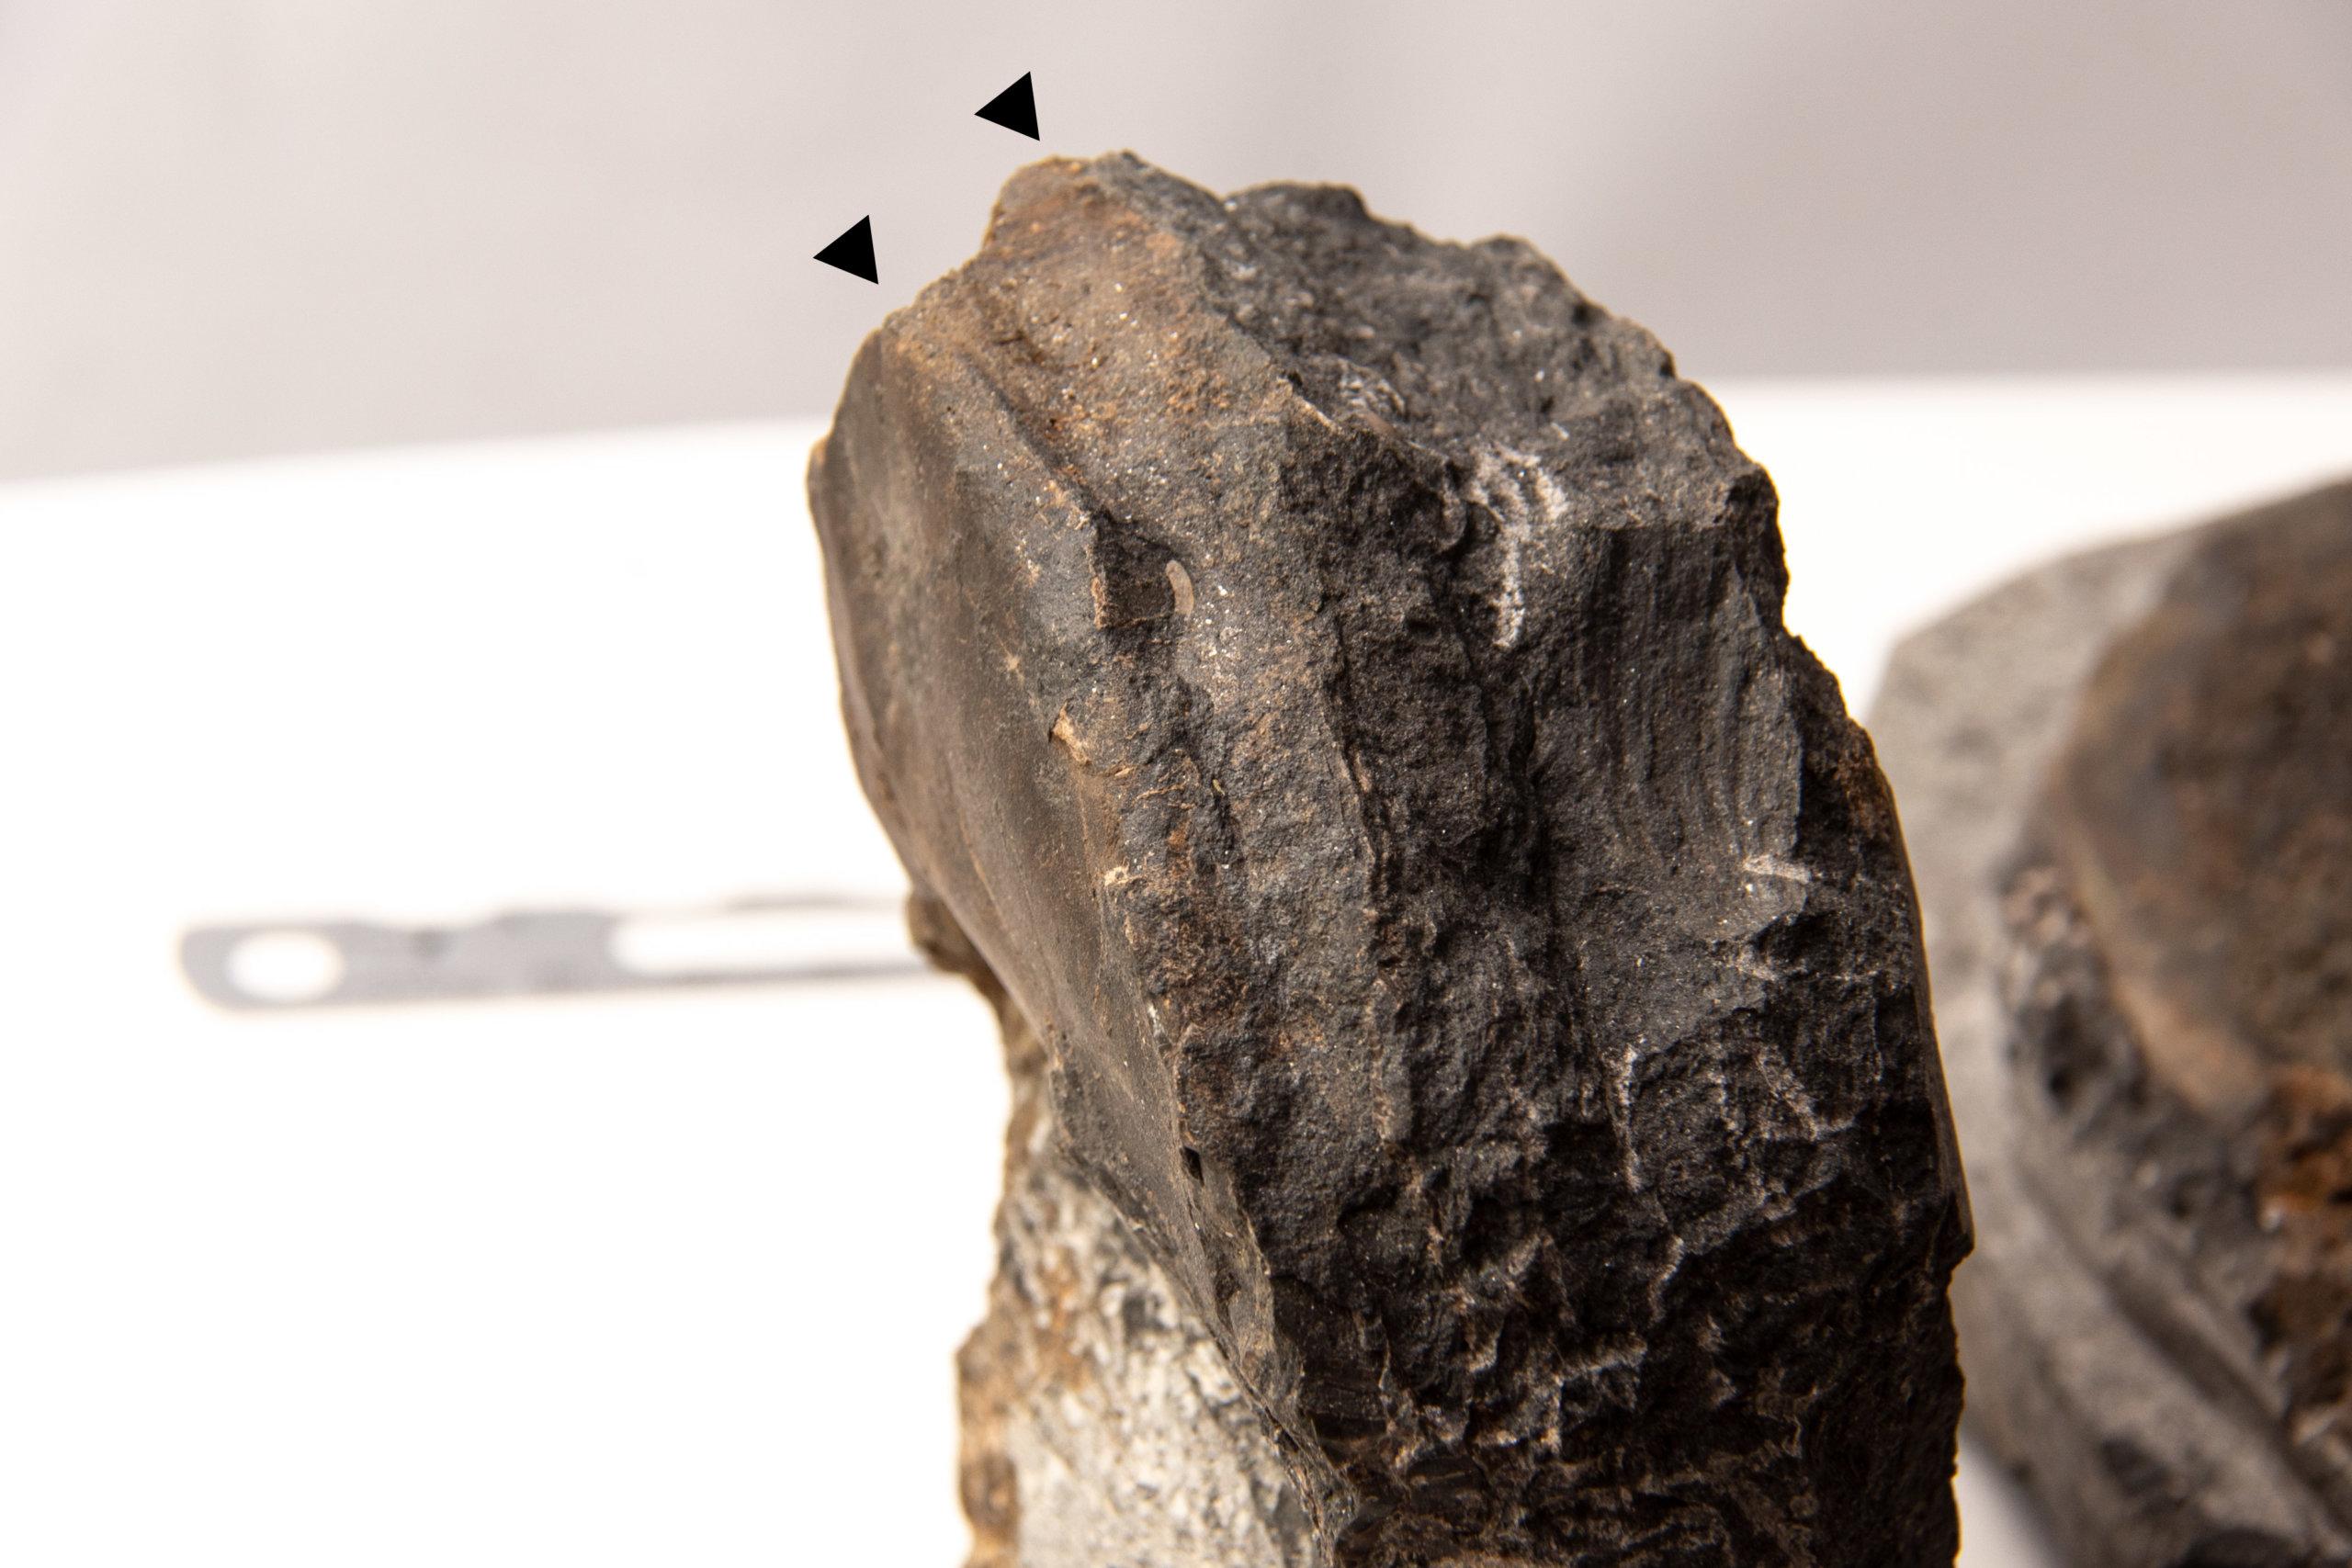 domatoceras-venter-ridges-cg-0068-scaled